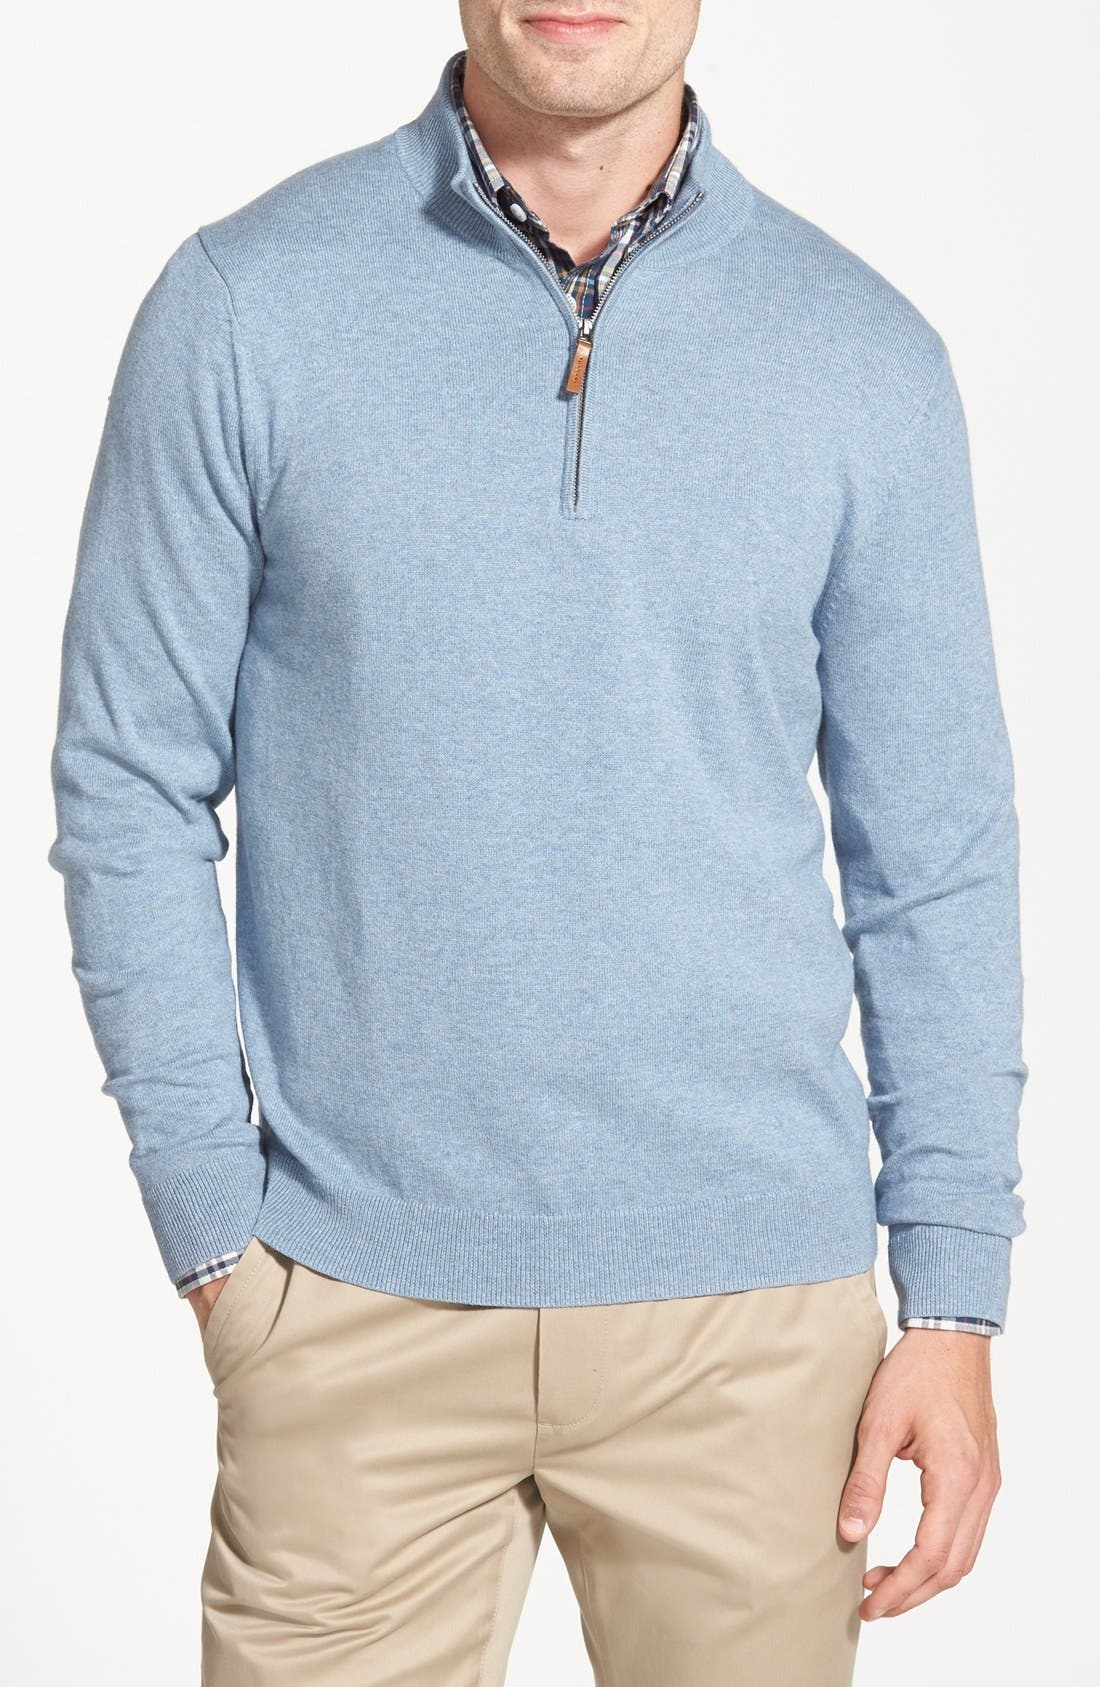 Alternate Image 1 Selected - Nordstrom Men's Shop Quarter Zip Sweater (Big)